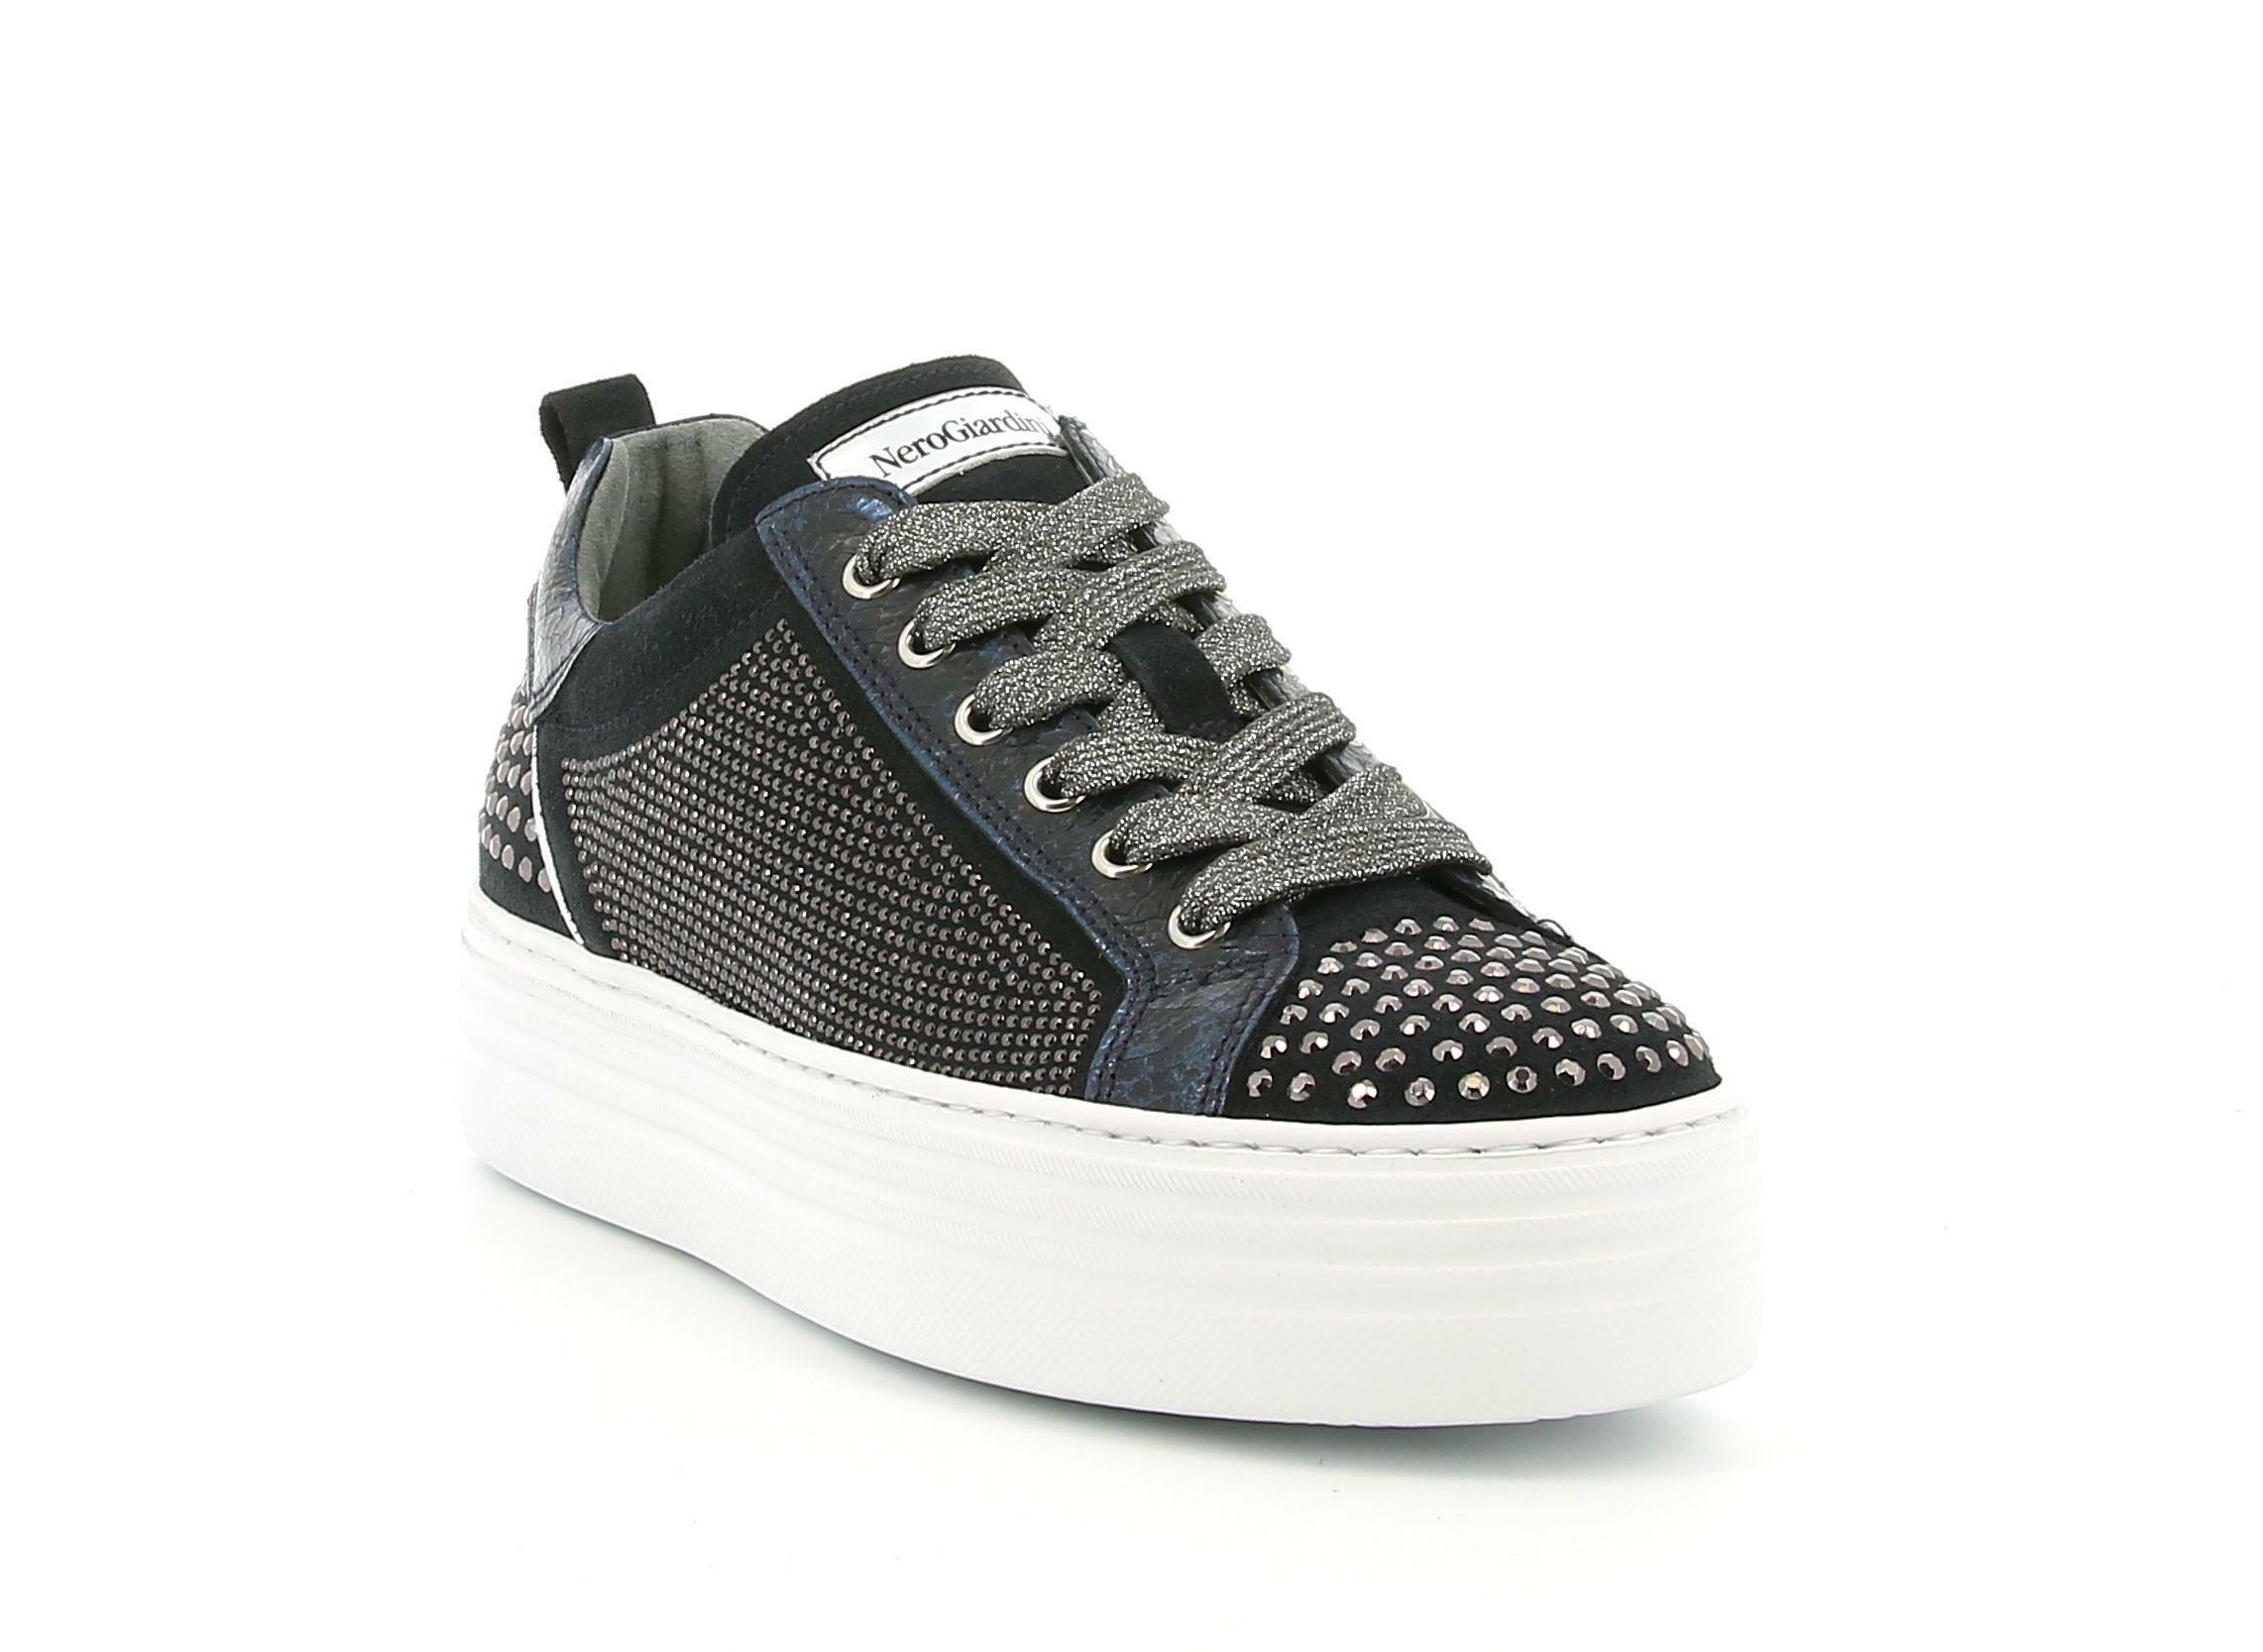 nero giardini nero giardini  i013374d 200 blu sneakers donna